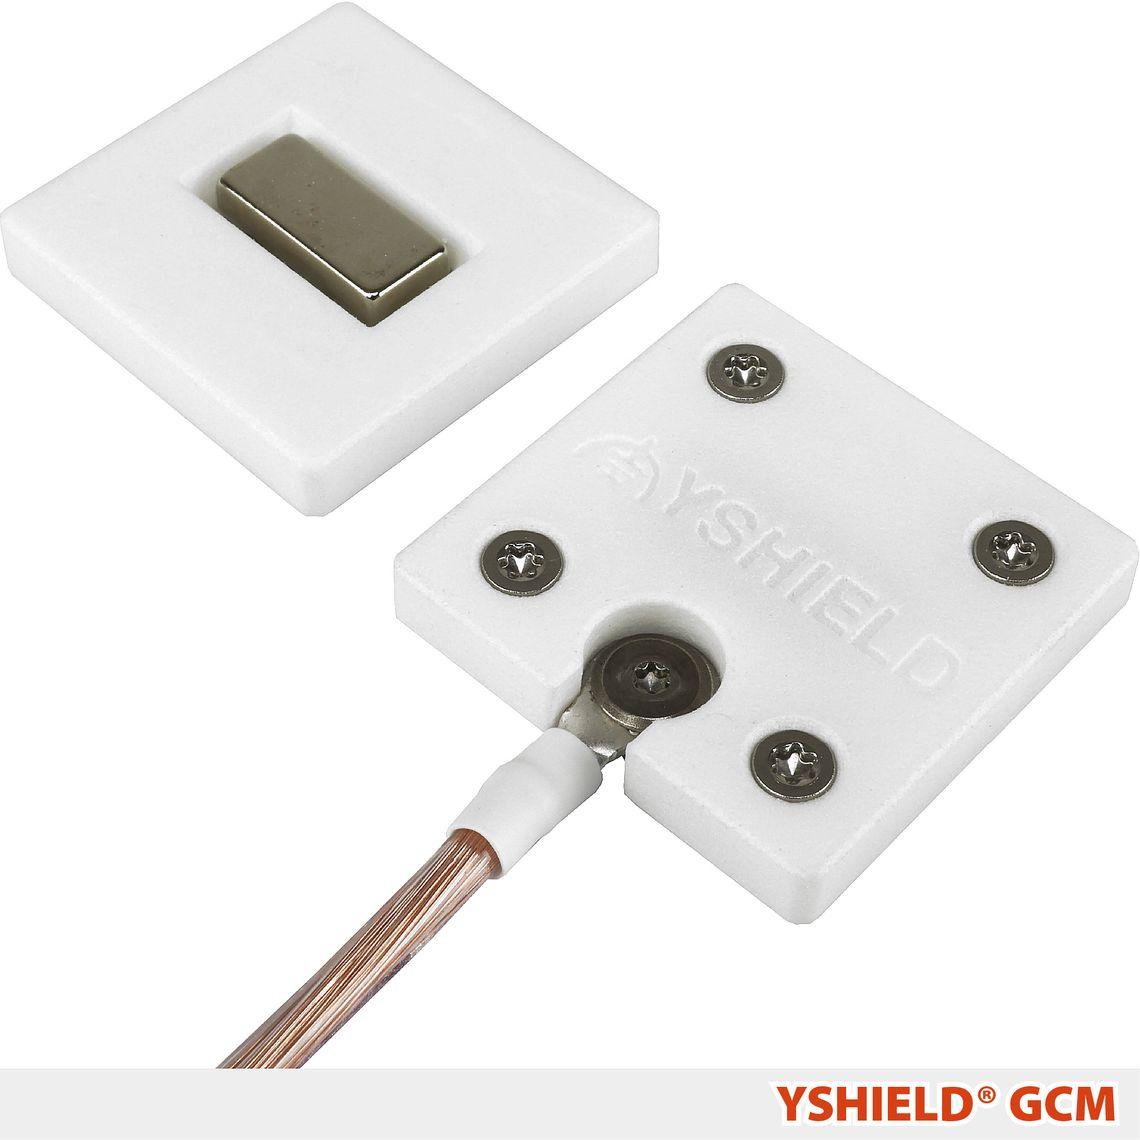 YSHIELD® GCM | Grounding connection Magnet